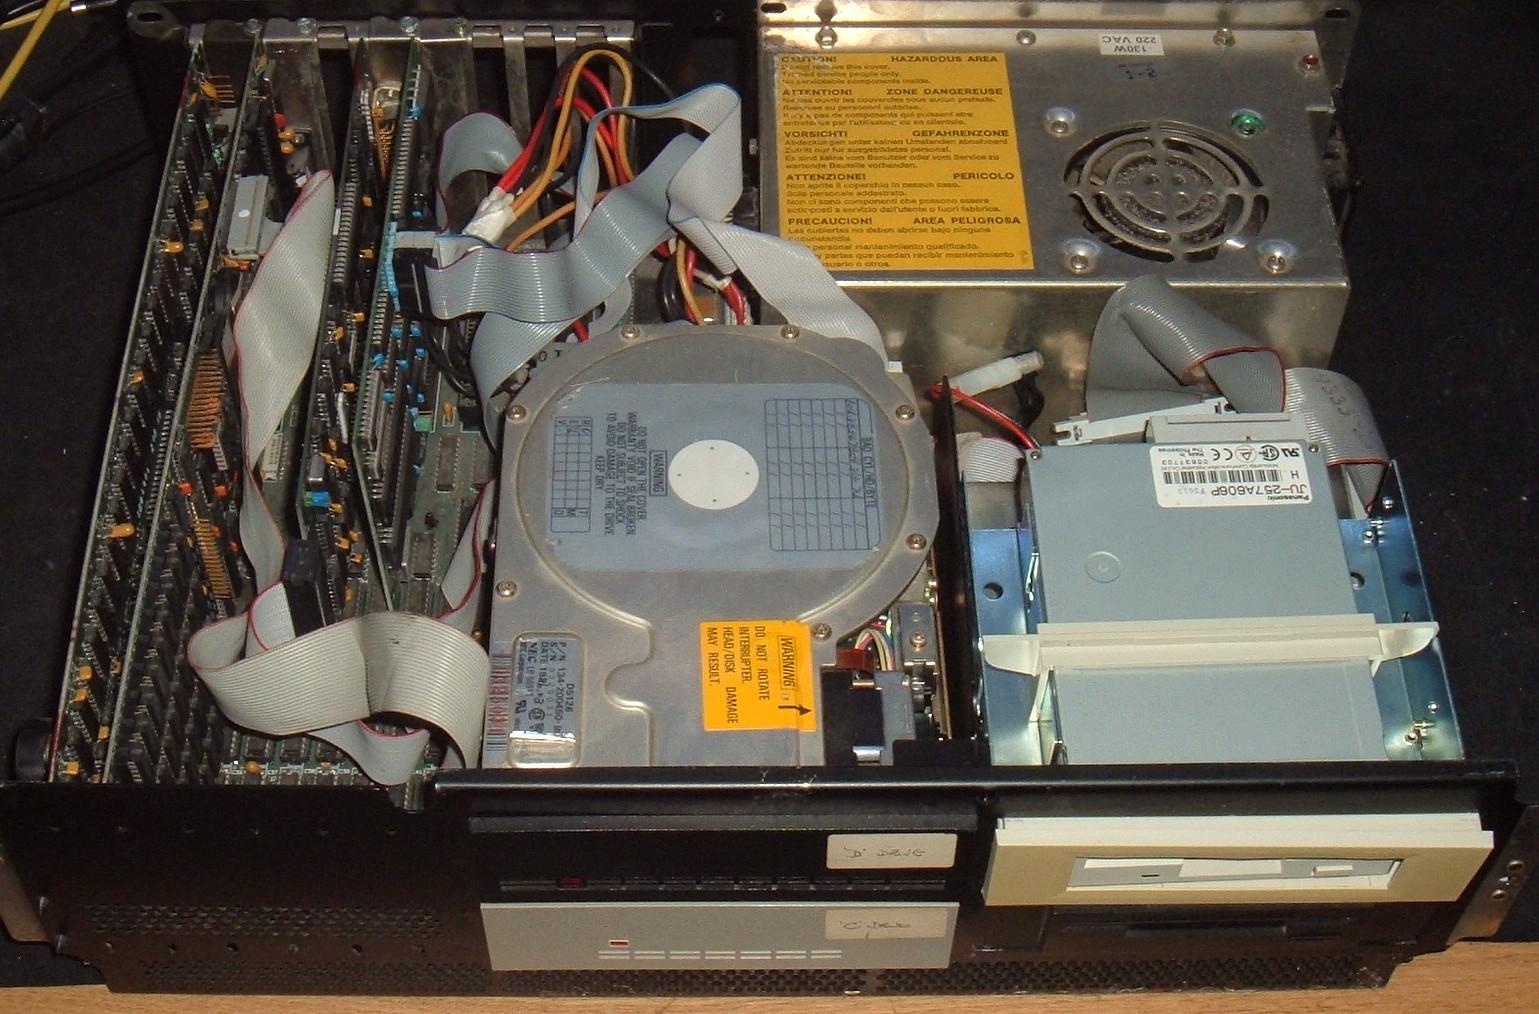 Tynemouth Software: Vintage IBM 5160 XT Teardown - Part 1